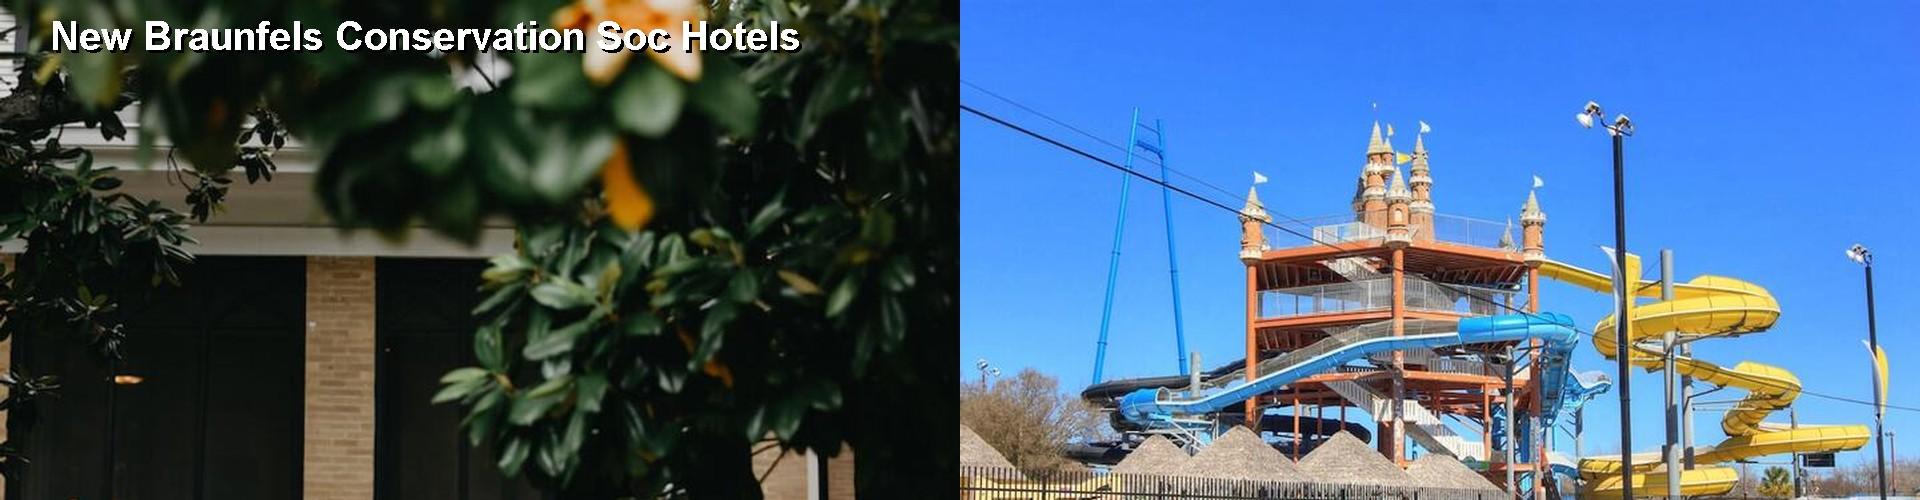 5 Best Hotels Near New Braunfels Conservation Soc